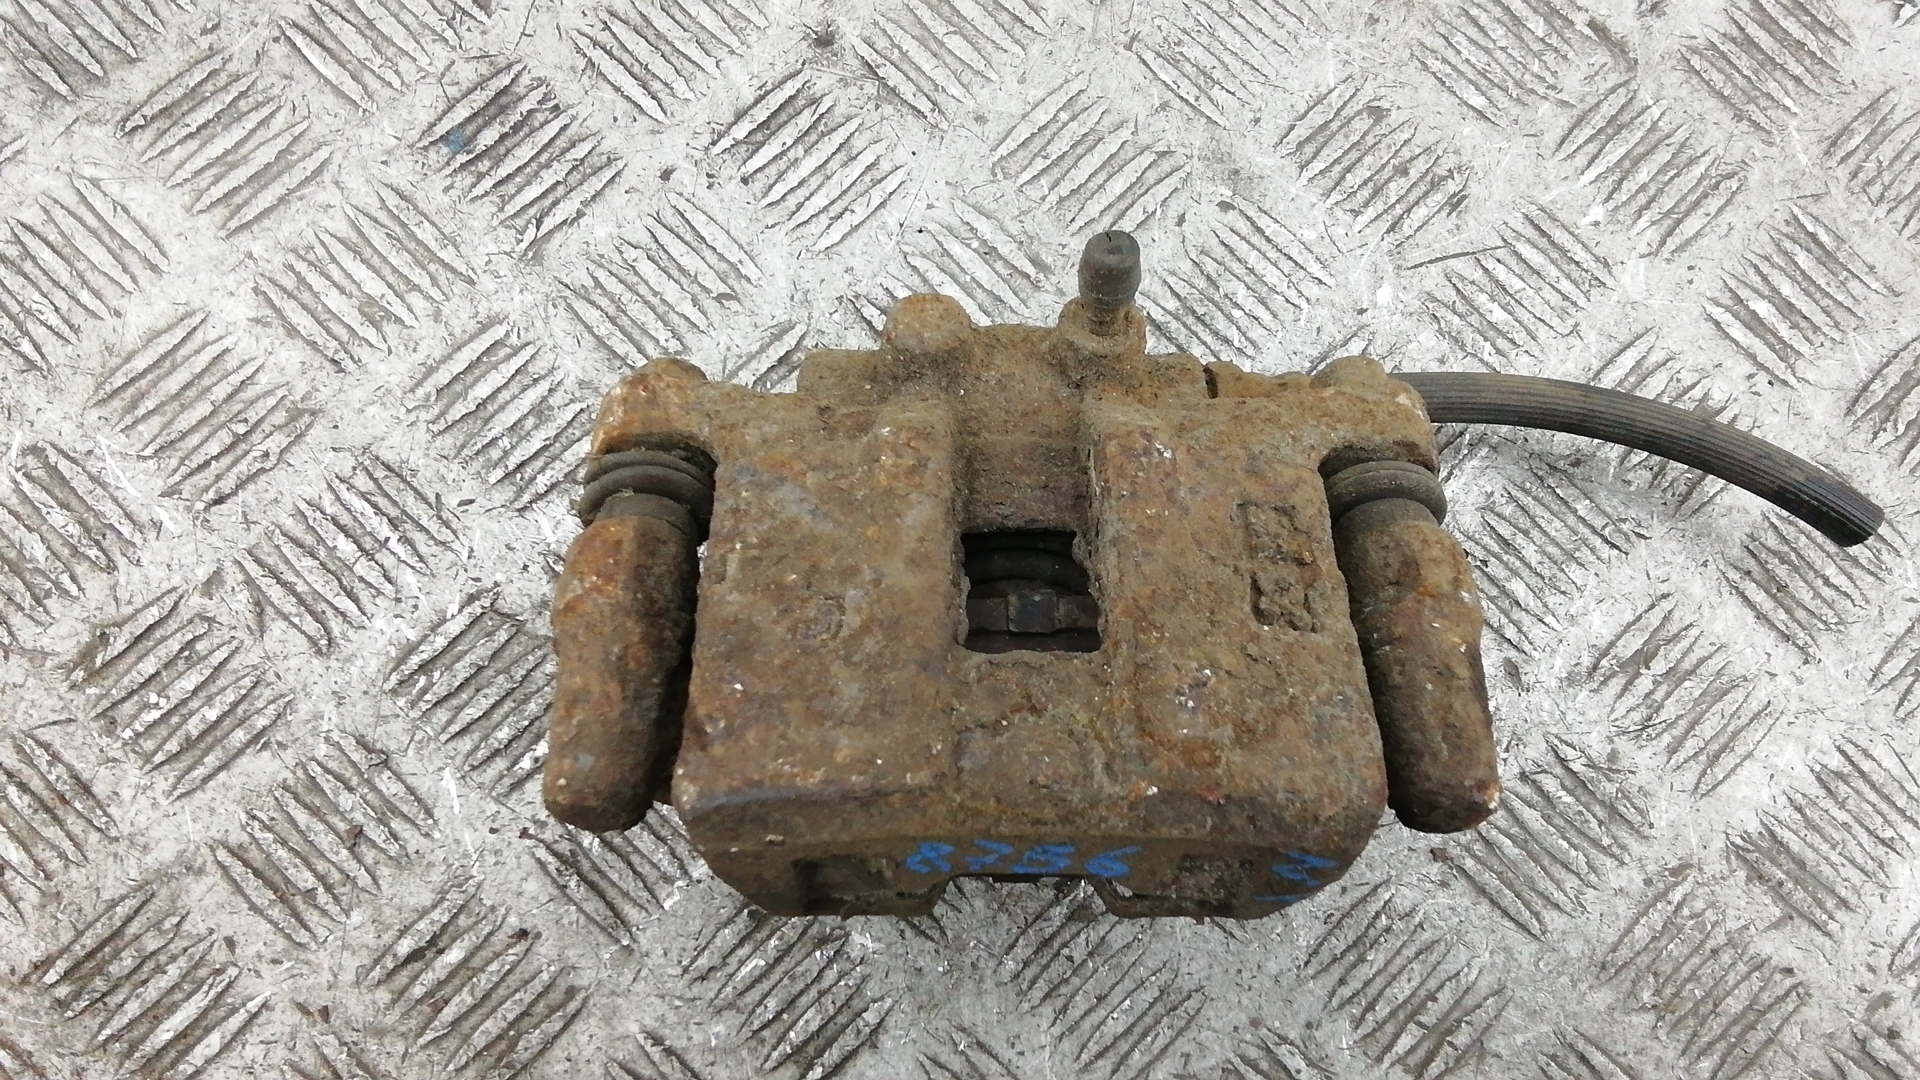 Суппорт тормозной задний правый, JEEP, PATRIOT MK, 2008